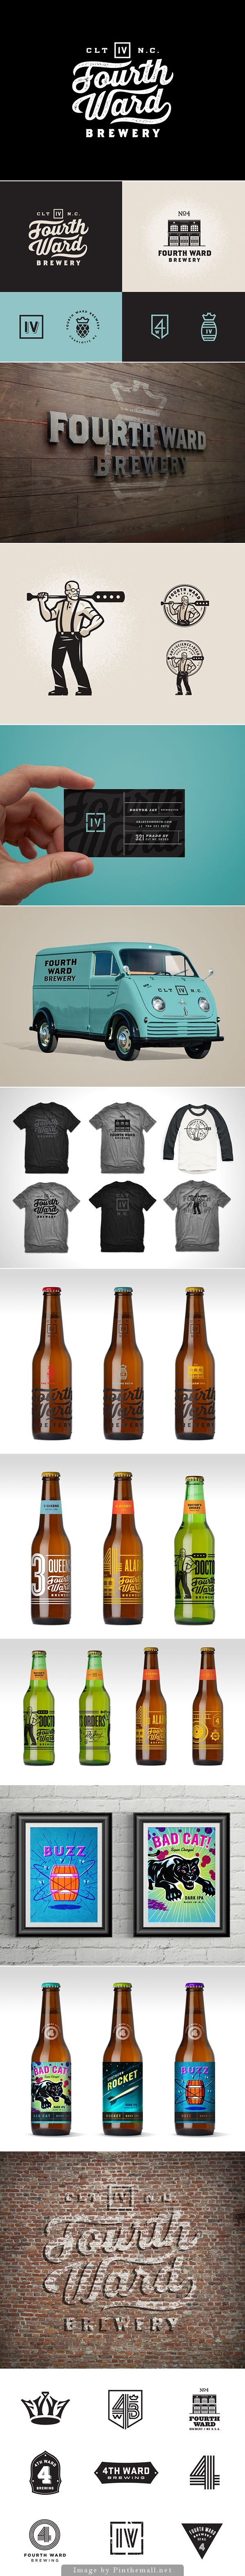 Fourth Ward Brewery By Matt Stevens (Business Card Restaurant)